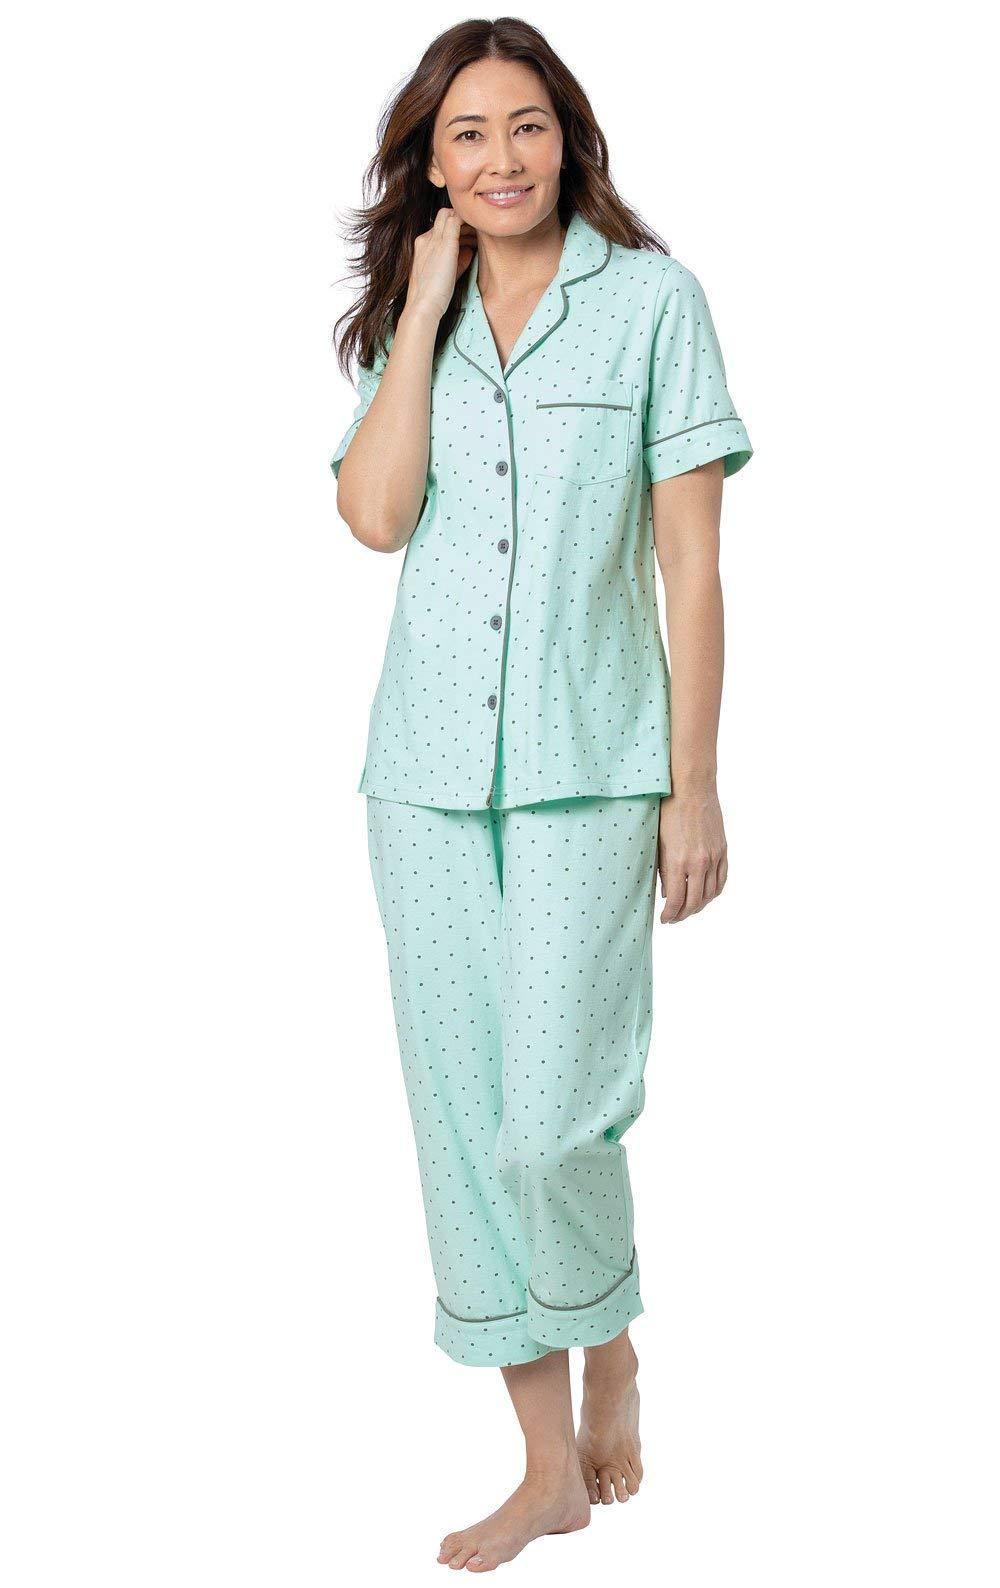 PajamaGram Womens Pajama Sets Cotton - Soft Pajamas for Women, Mint, L, 14-16 by PajamaGram